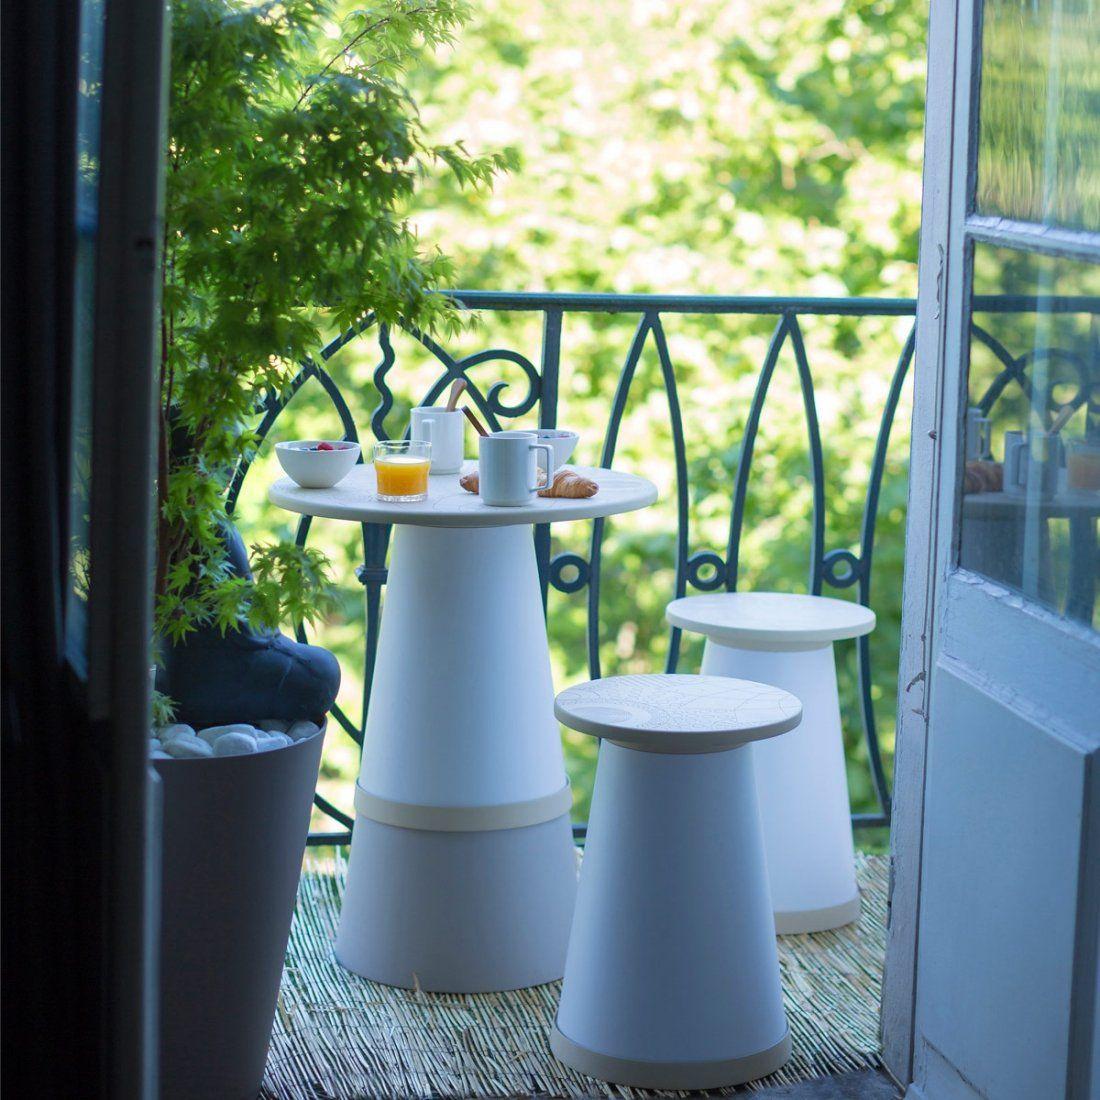 Salon De Jardin Pour Balcon Zen Totem Grosfillex ... tout Salon De Jardin Totem